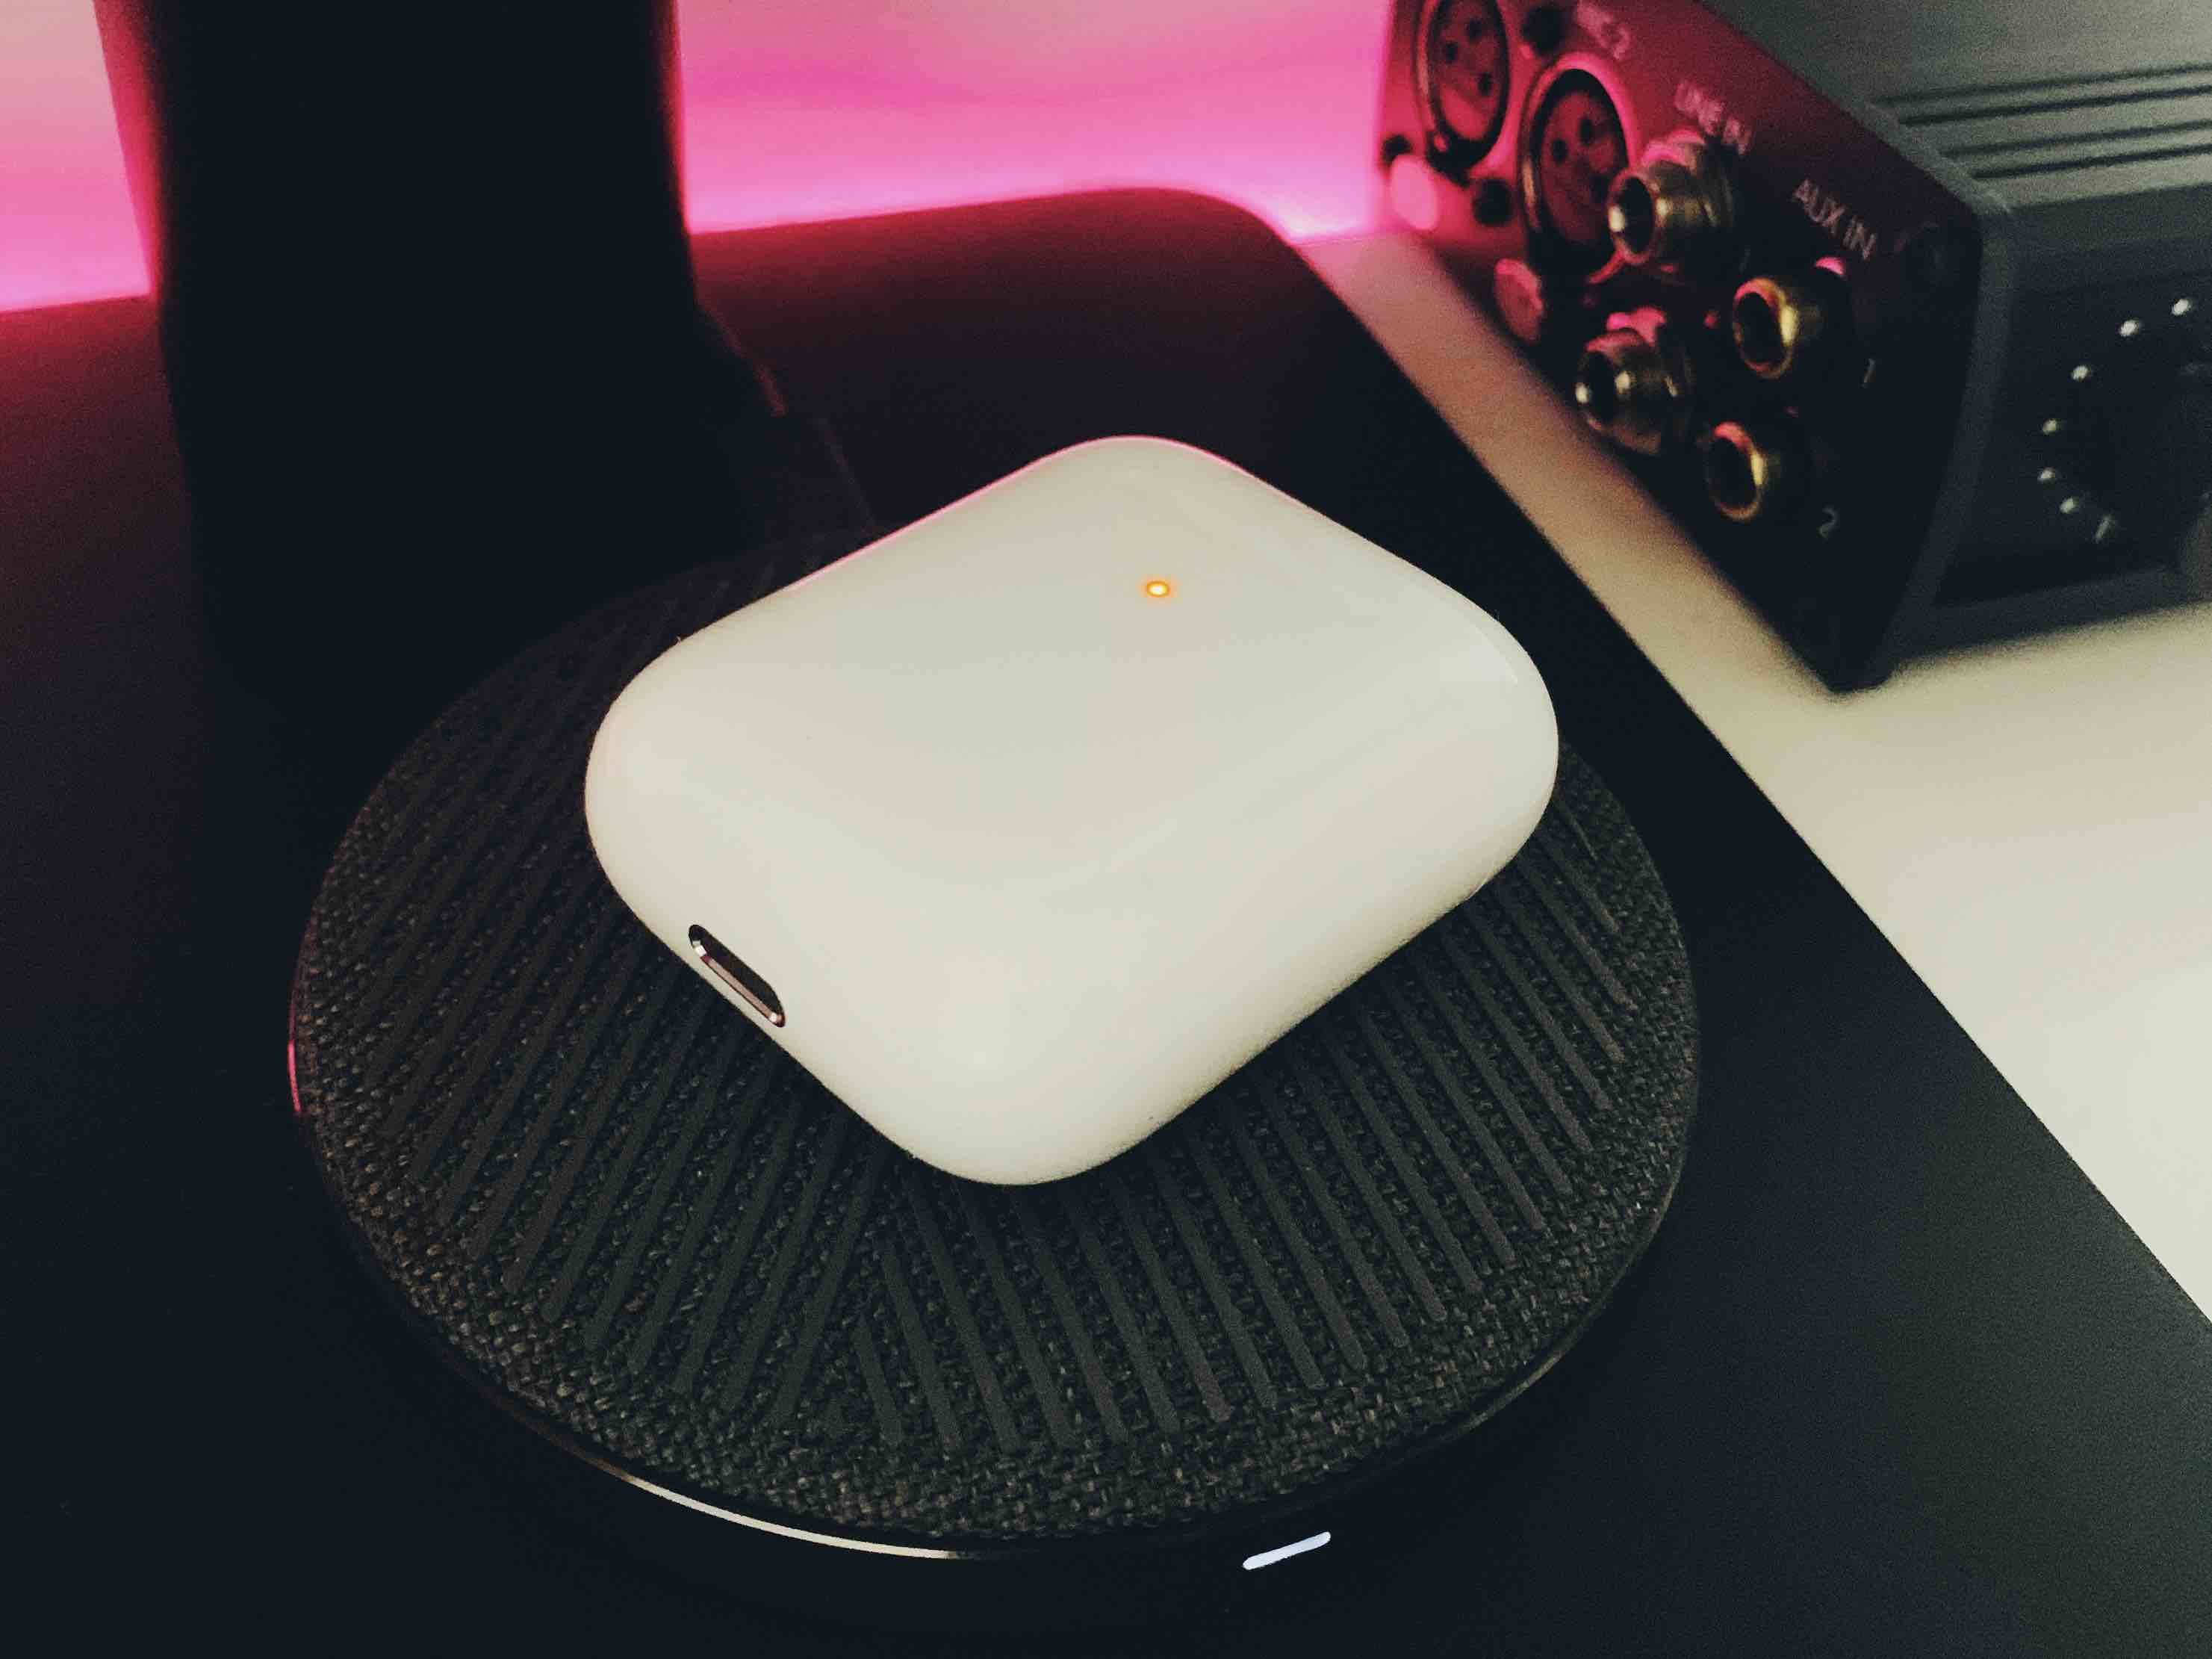 airpods 2 wireless charging - Чем Powerbeats Pro отличаются от AirPods 2